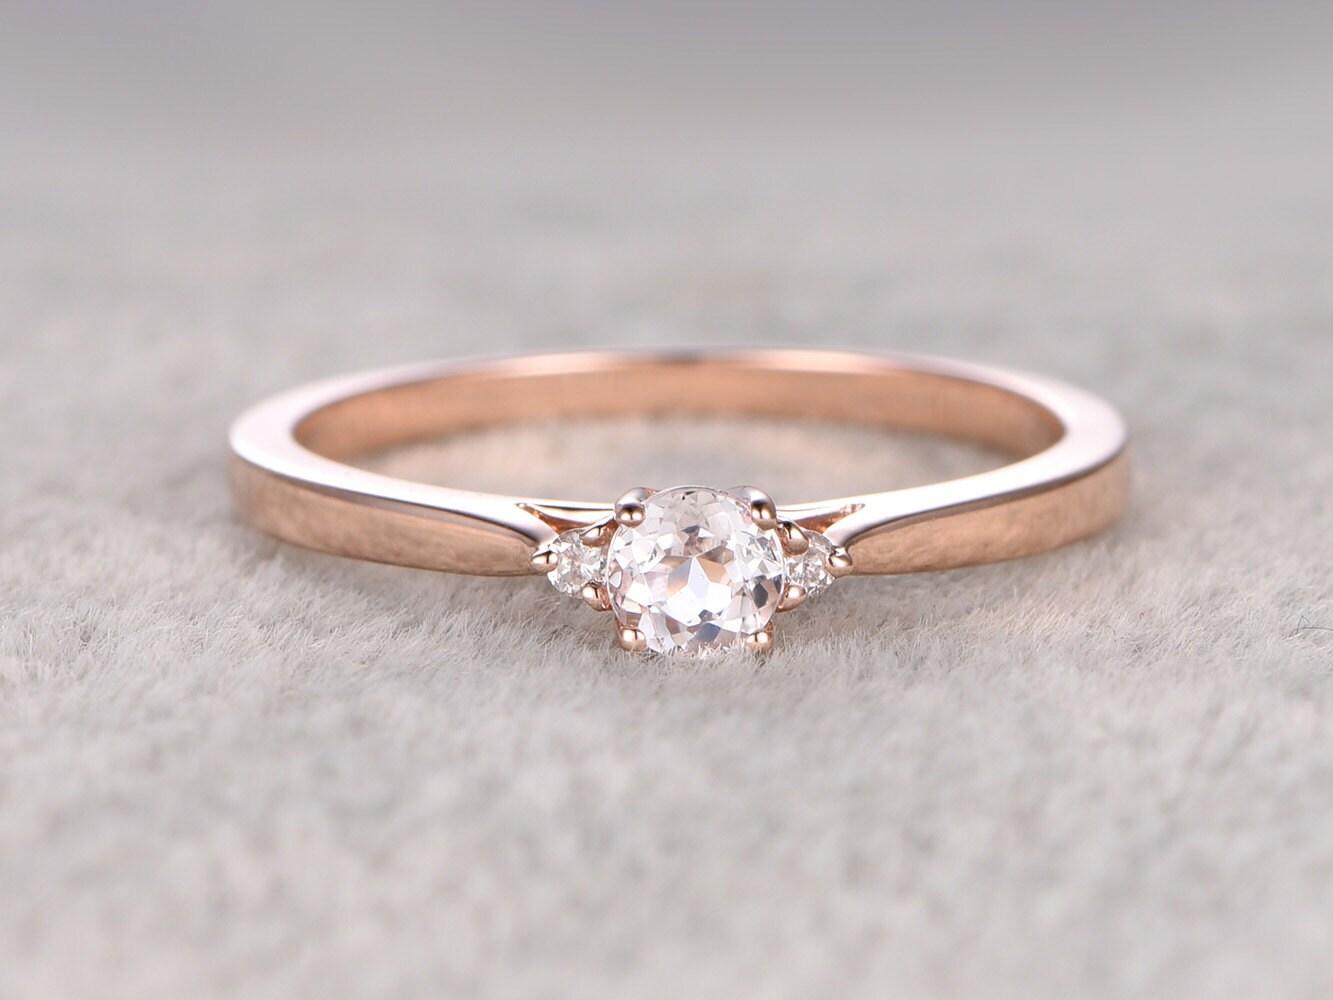 3 stones morganite engagement ring rose golddiamond wedding. Black Bedroom Furniture Sets. Home Design Ideas